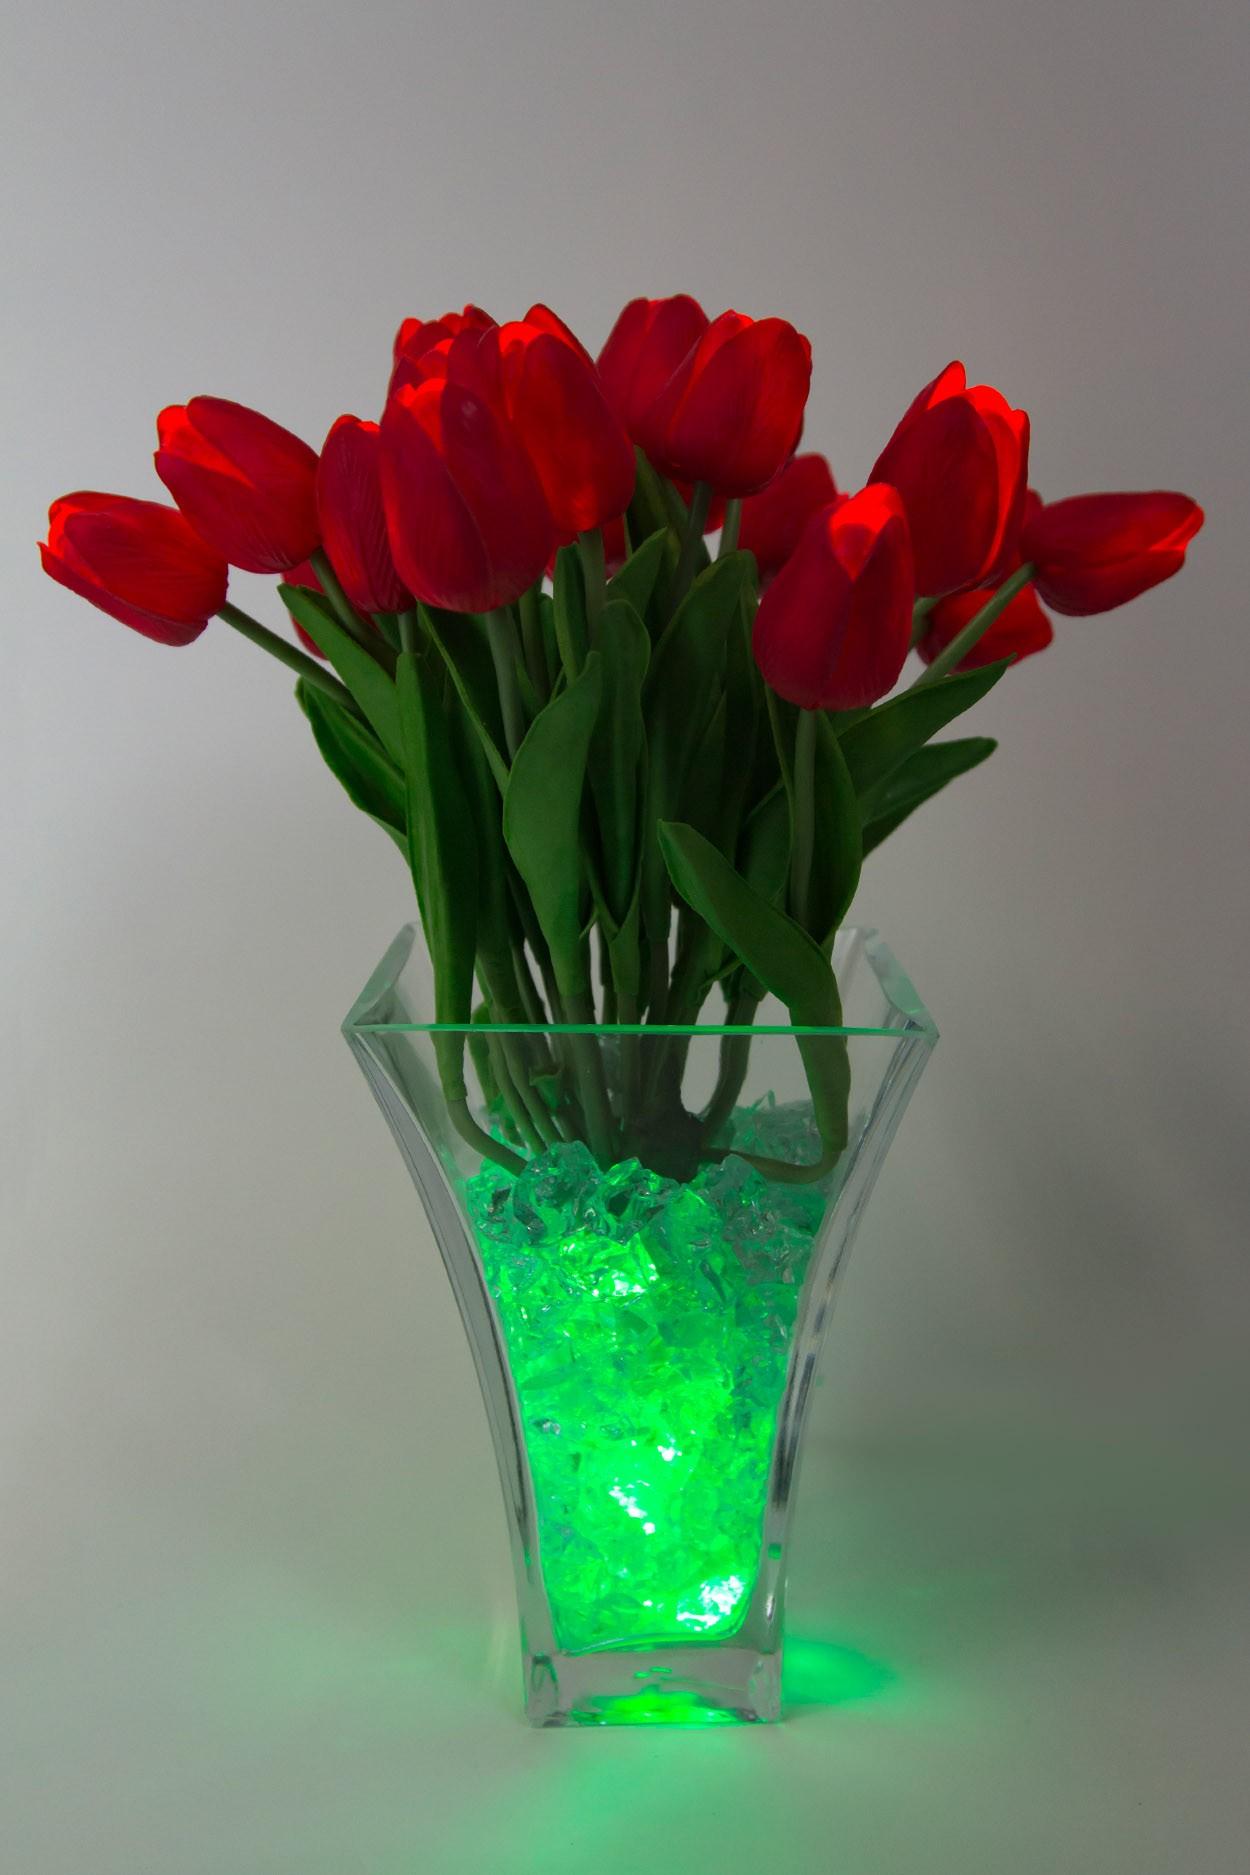 Светящиеся цветы тюльпаны 21шт  Красные(зел)